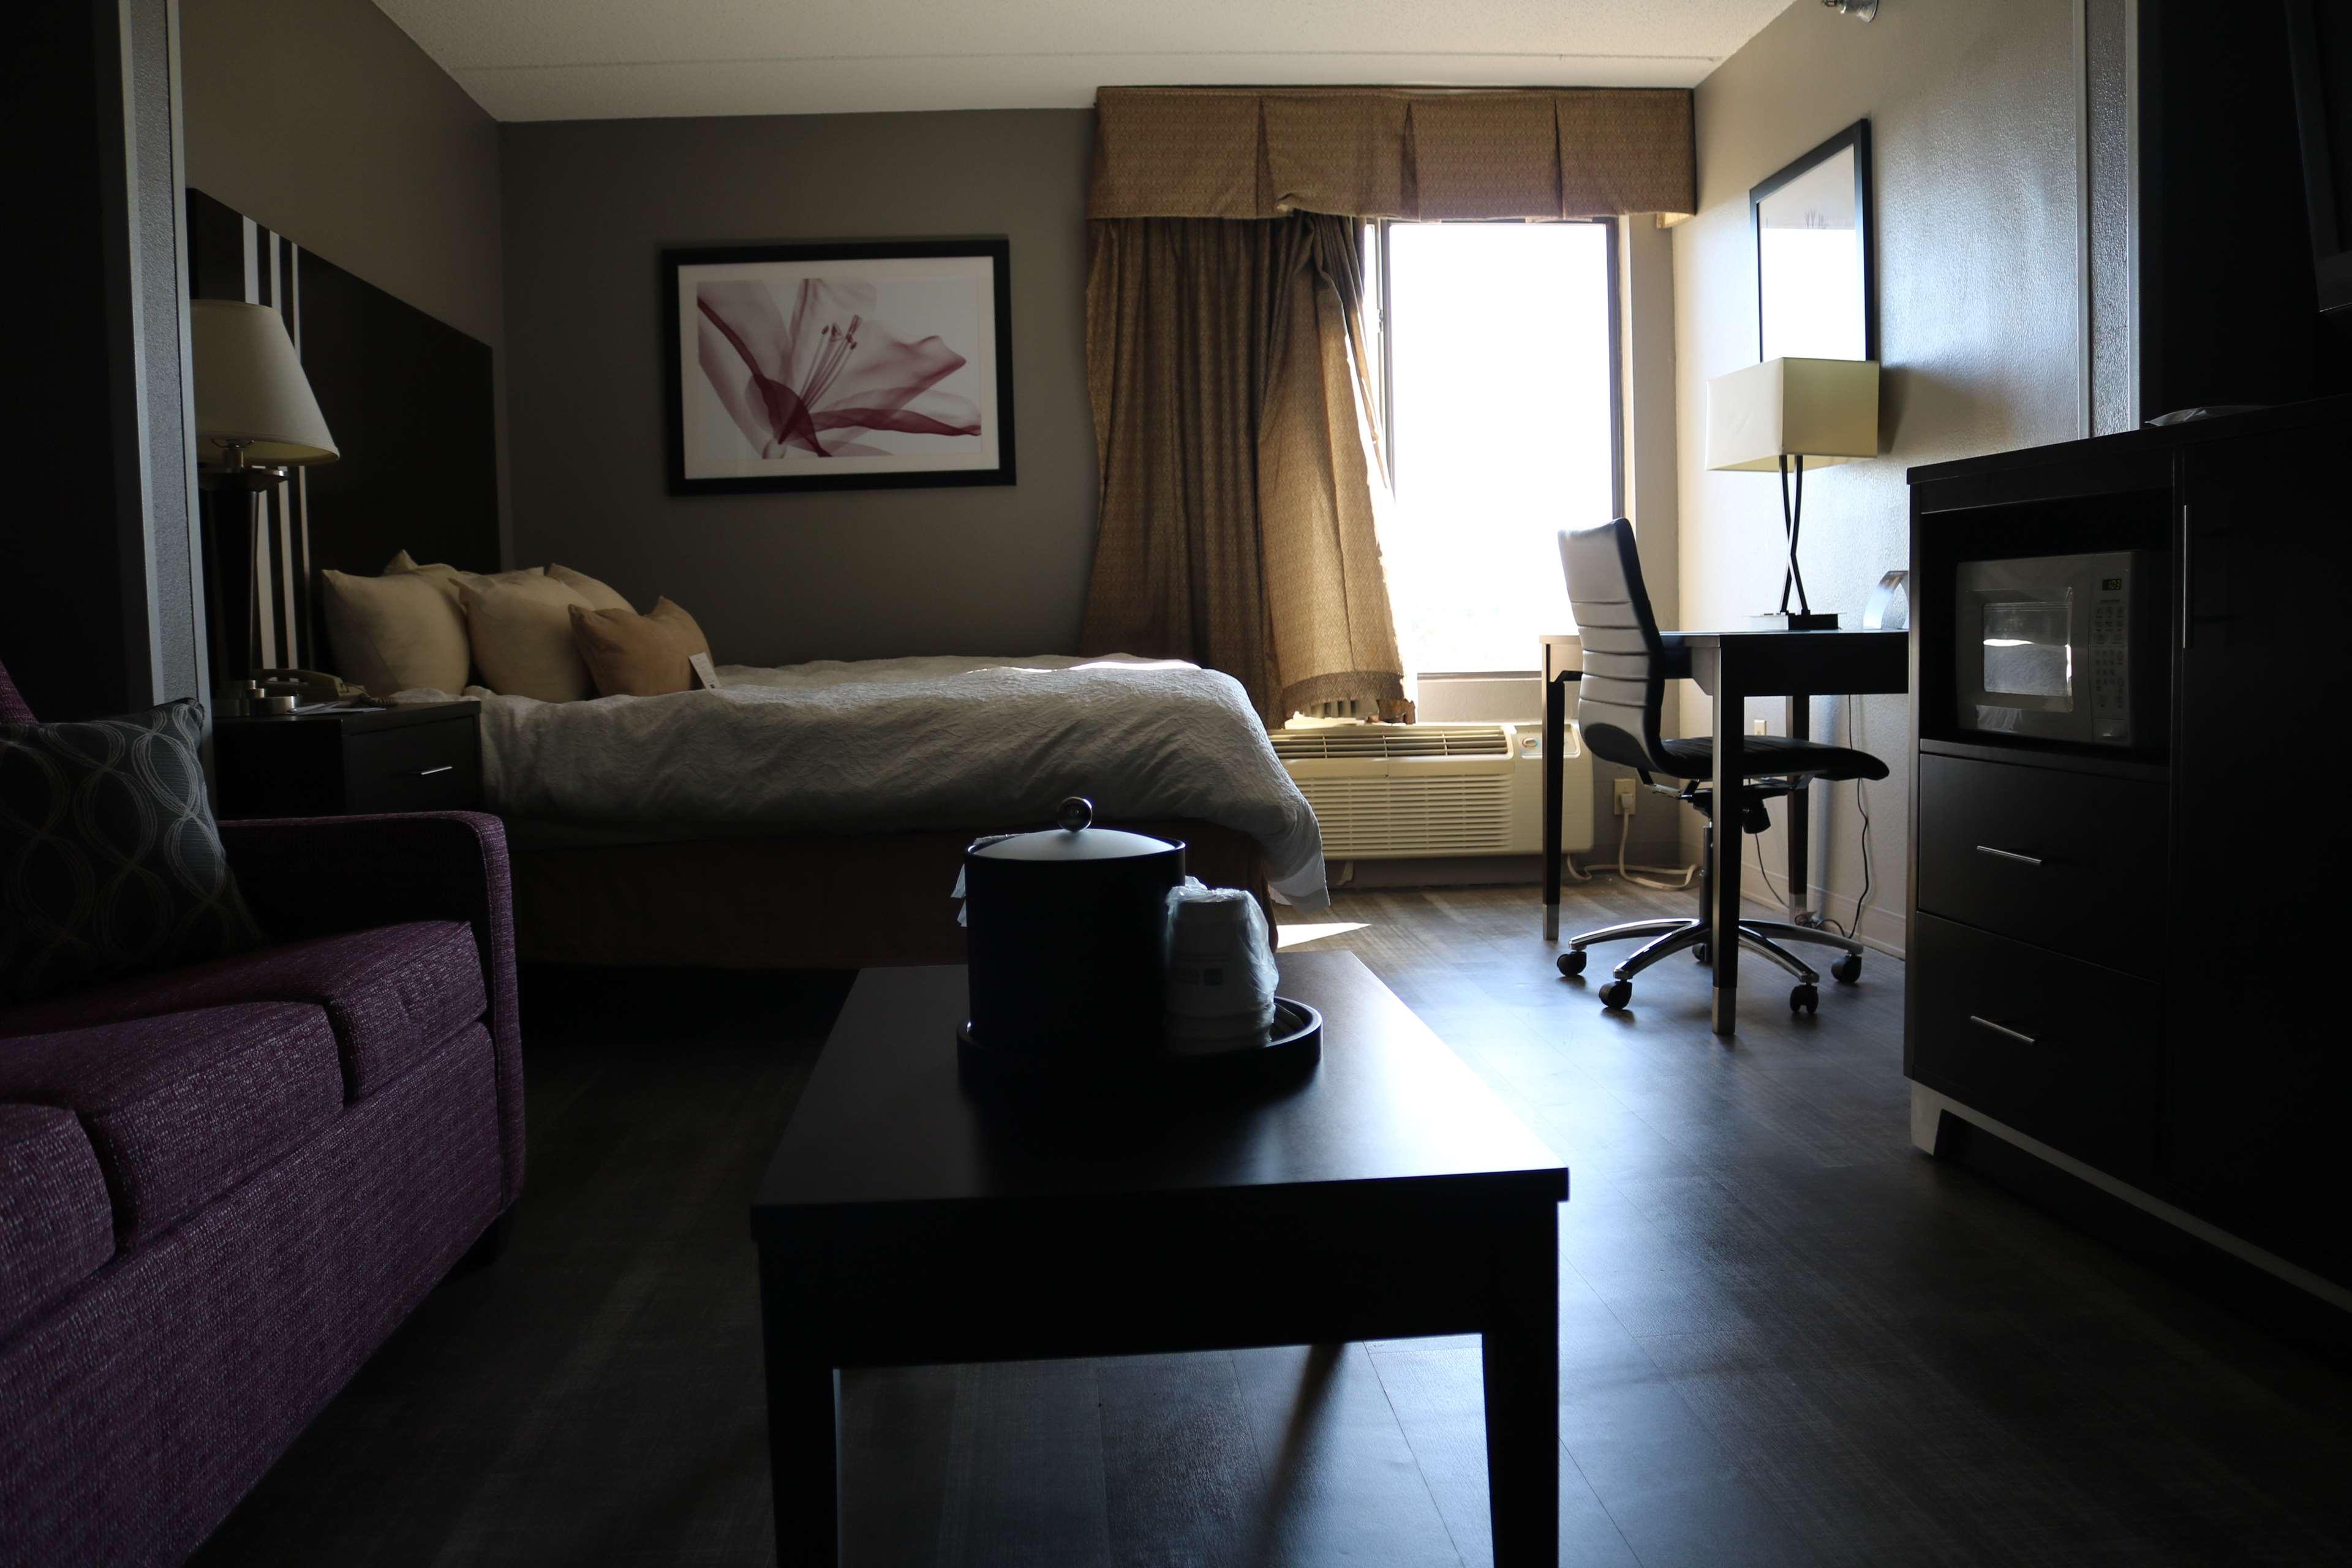 Best Western Plus Greensboro Airport Hotel image 17